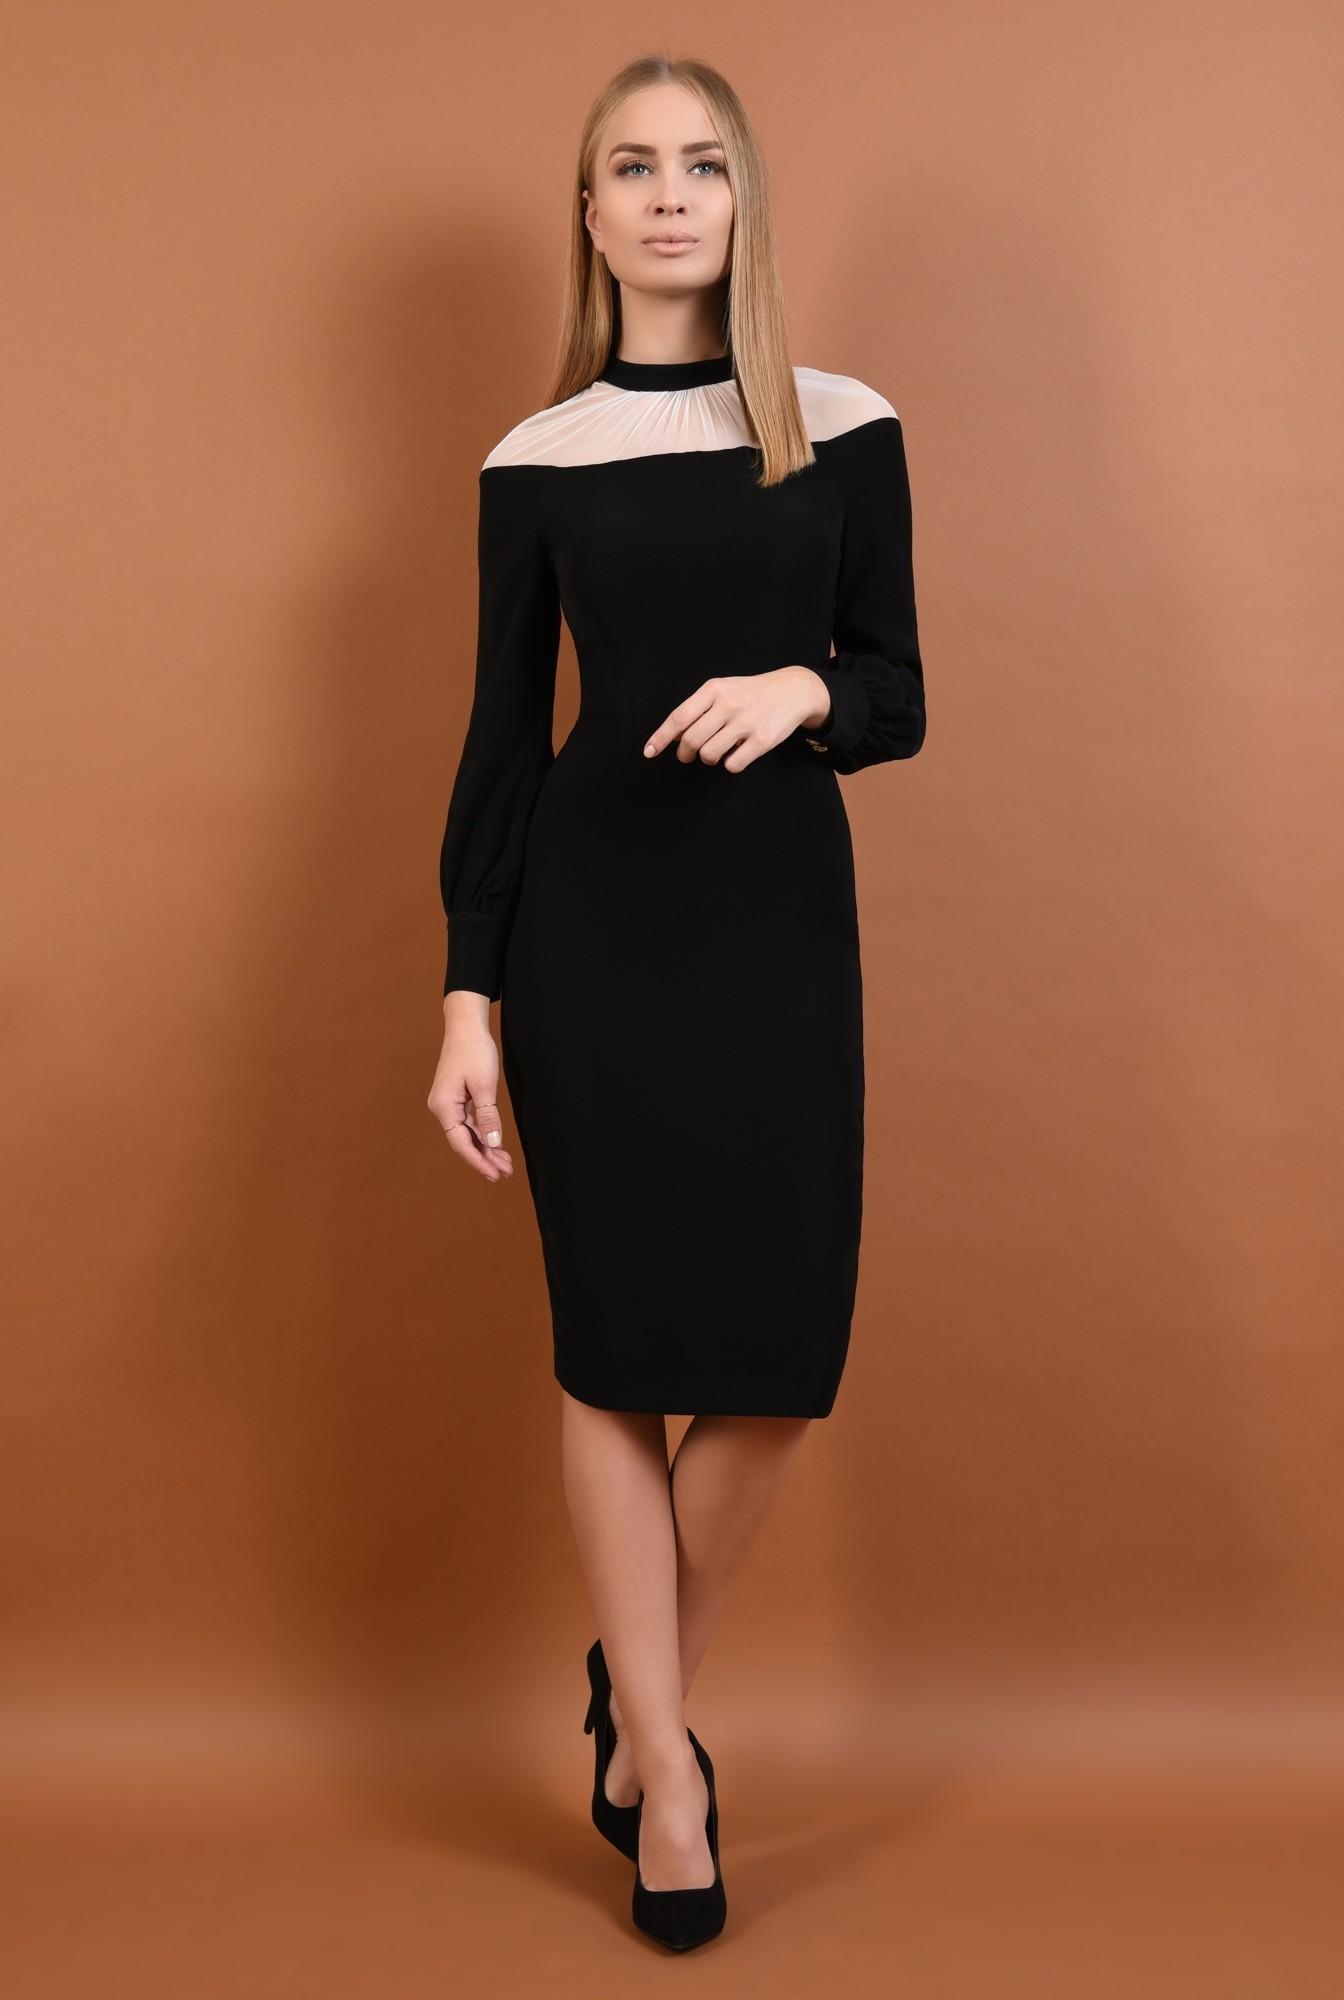 360 - rochie eleganta, midi, conica, neagra, insertie tul, nasturi metalici